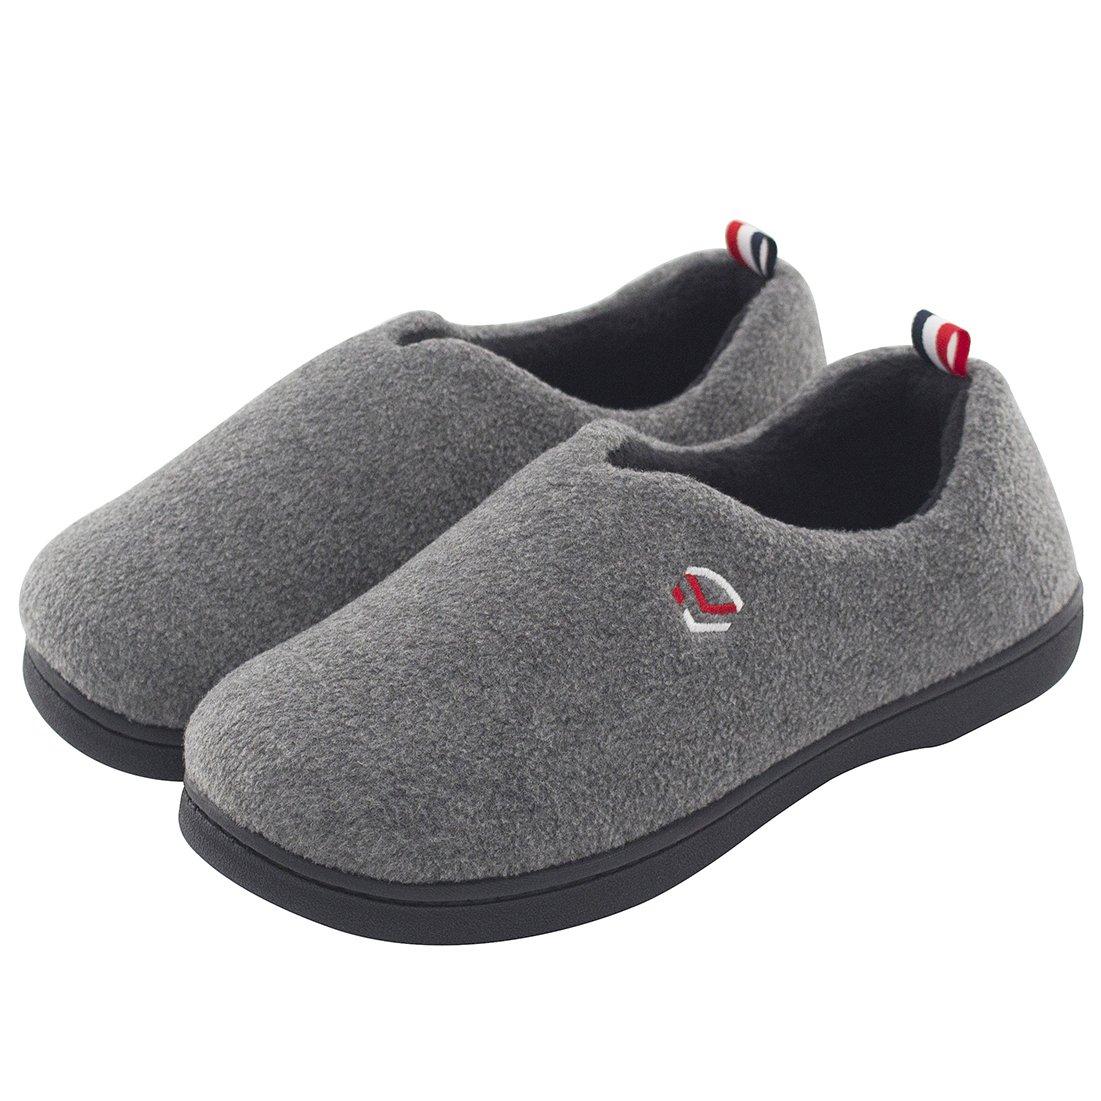 Women's Comfort Polar Fleece Slip on Slippers Color Block Memory Foam House Loafers Shoes w/Indoor, Outdoor Sole (Medium/7-8 B(M) US, Gray)